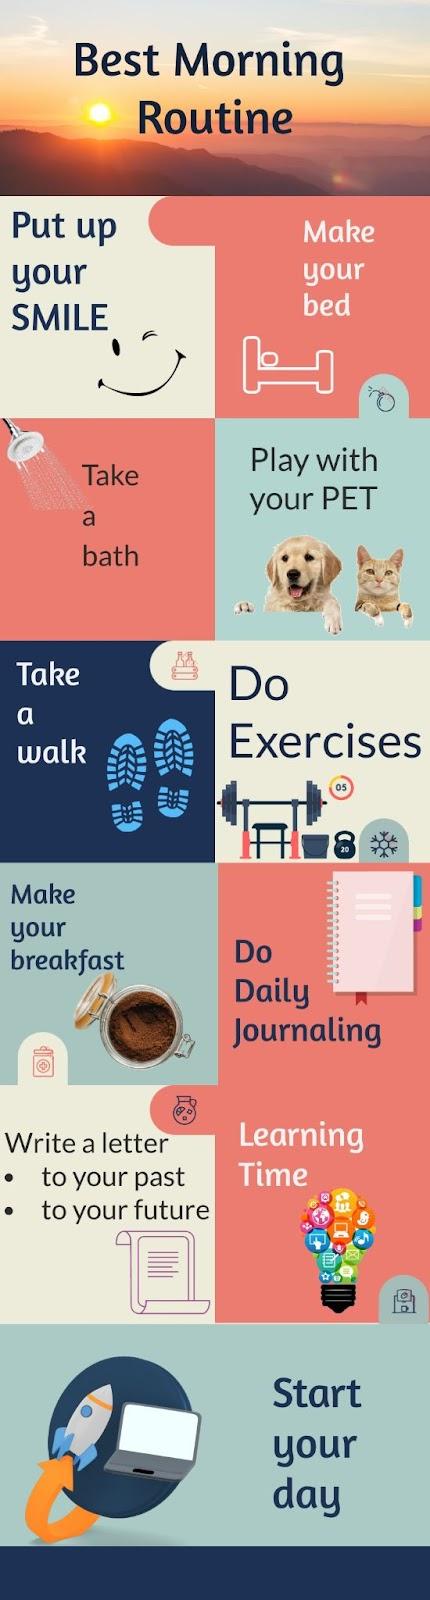 Morning Routine ideas checklist chart